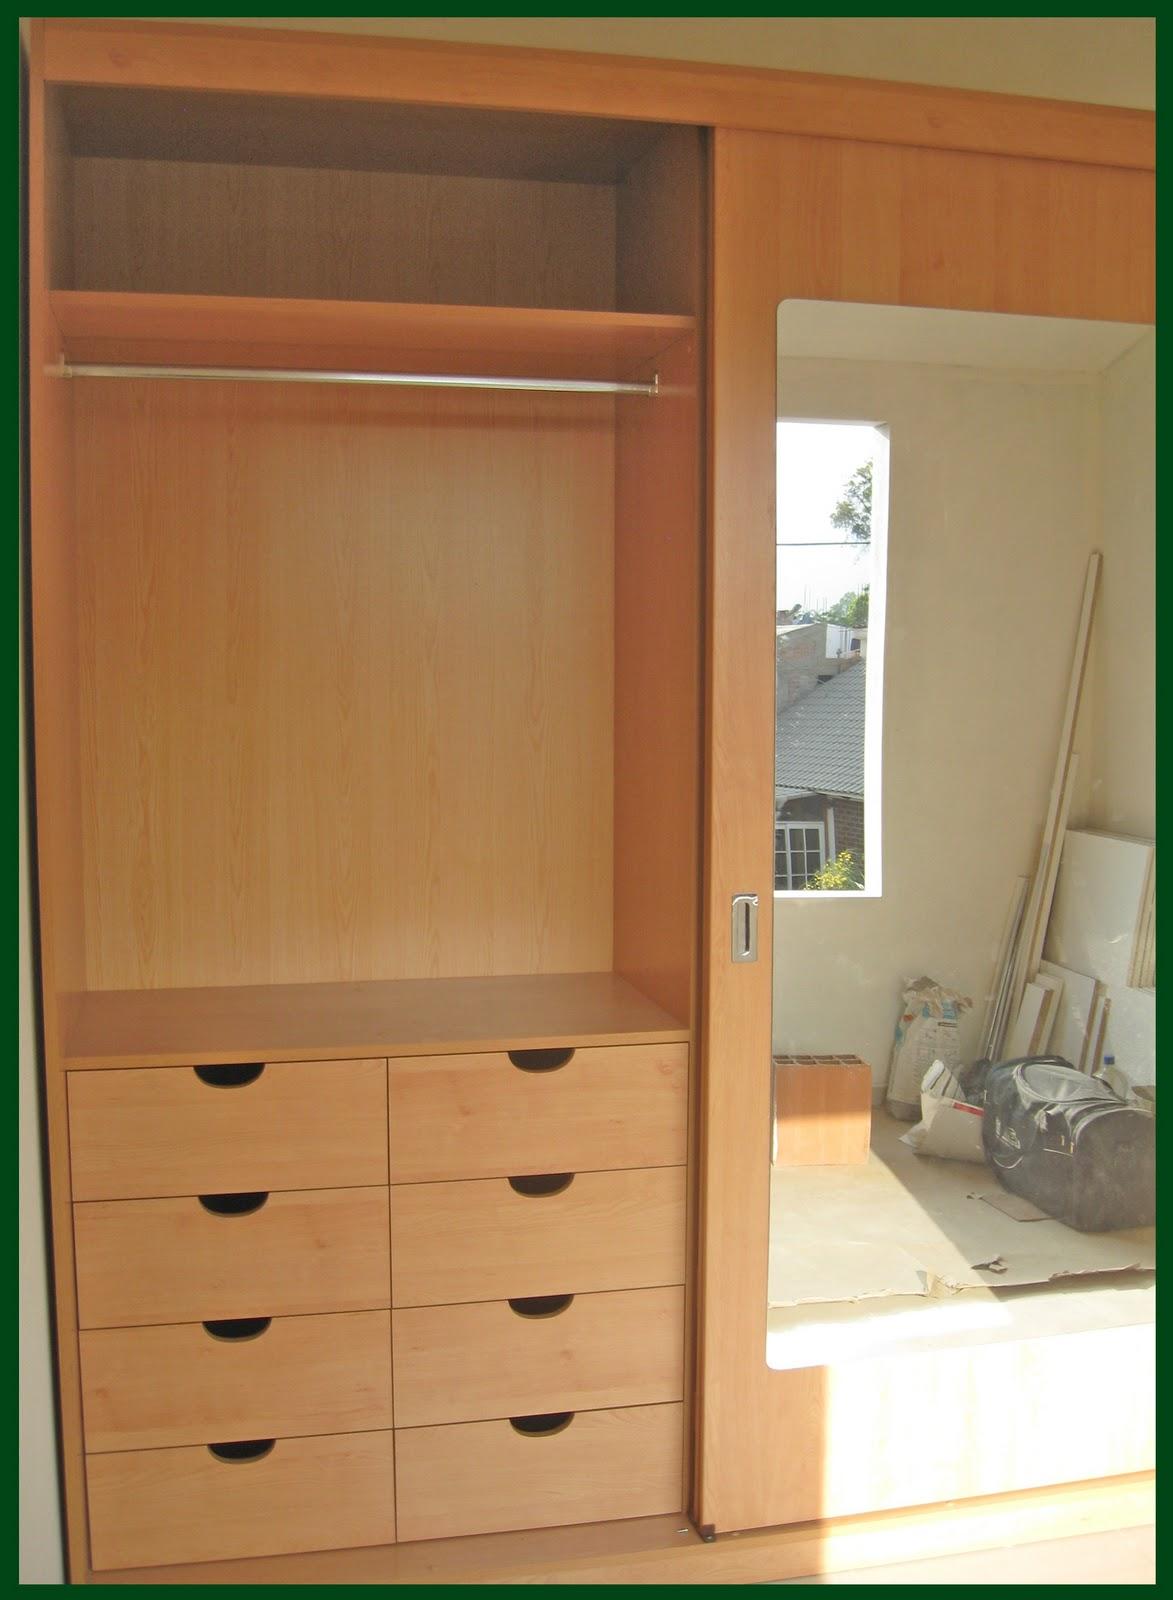 Muebles jose luis chingay closet exclusivo color haya for Puerta walking closet